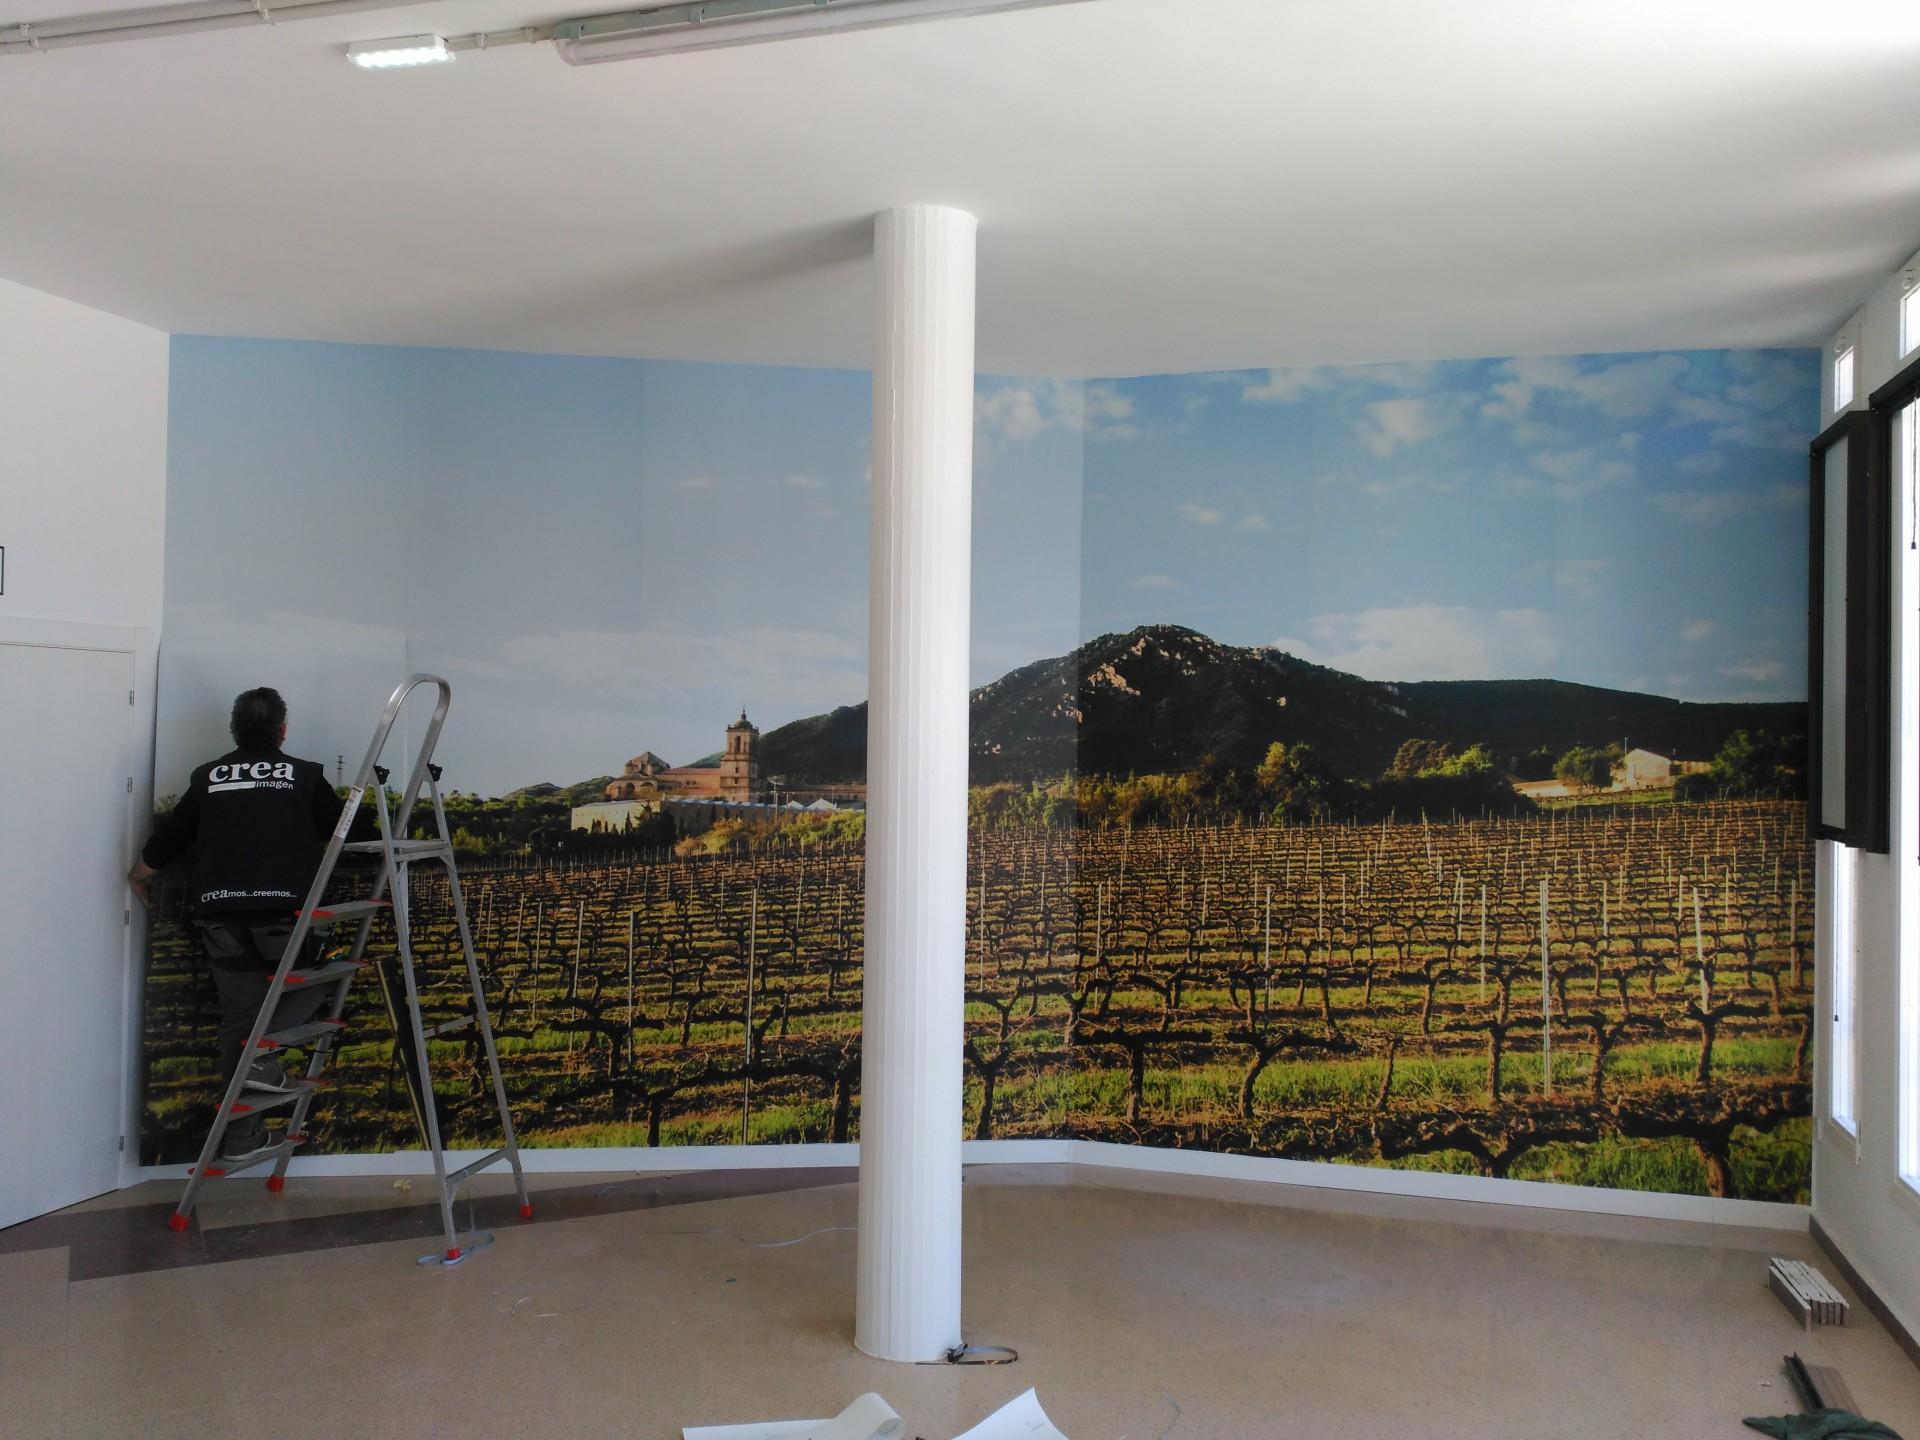 mural_muraldepared_muralparapared_pared_interior_polideportivo_ayegui_navarra_ESTELLA_NAVARRA_IMPRESIÓN_DISEÑO_VINILOS_ROTULACIÓN